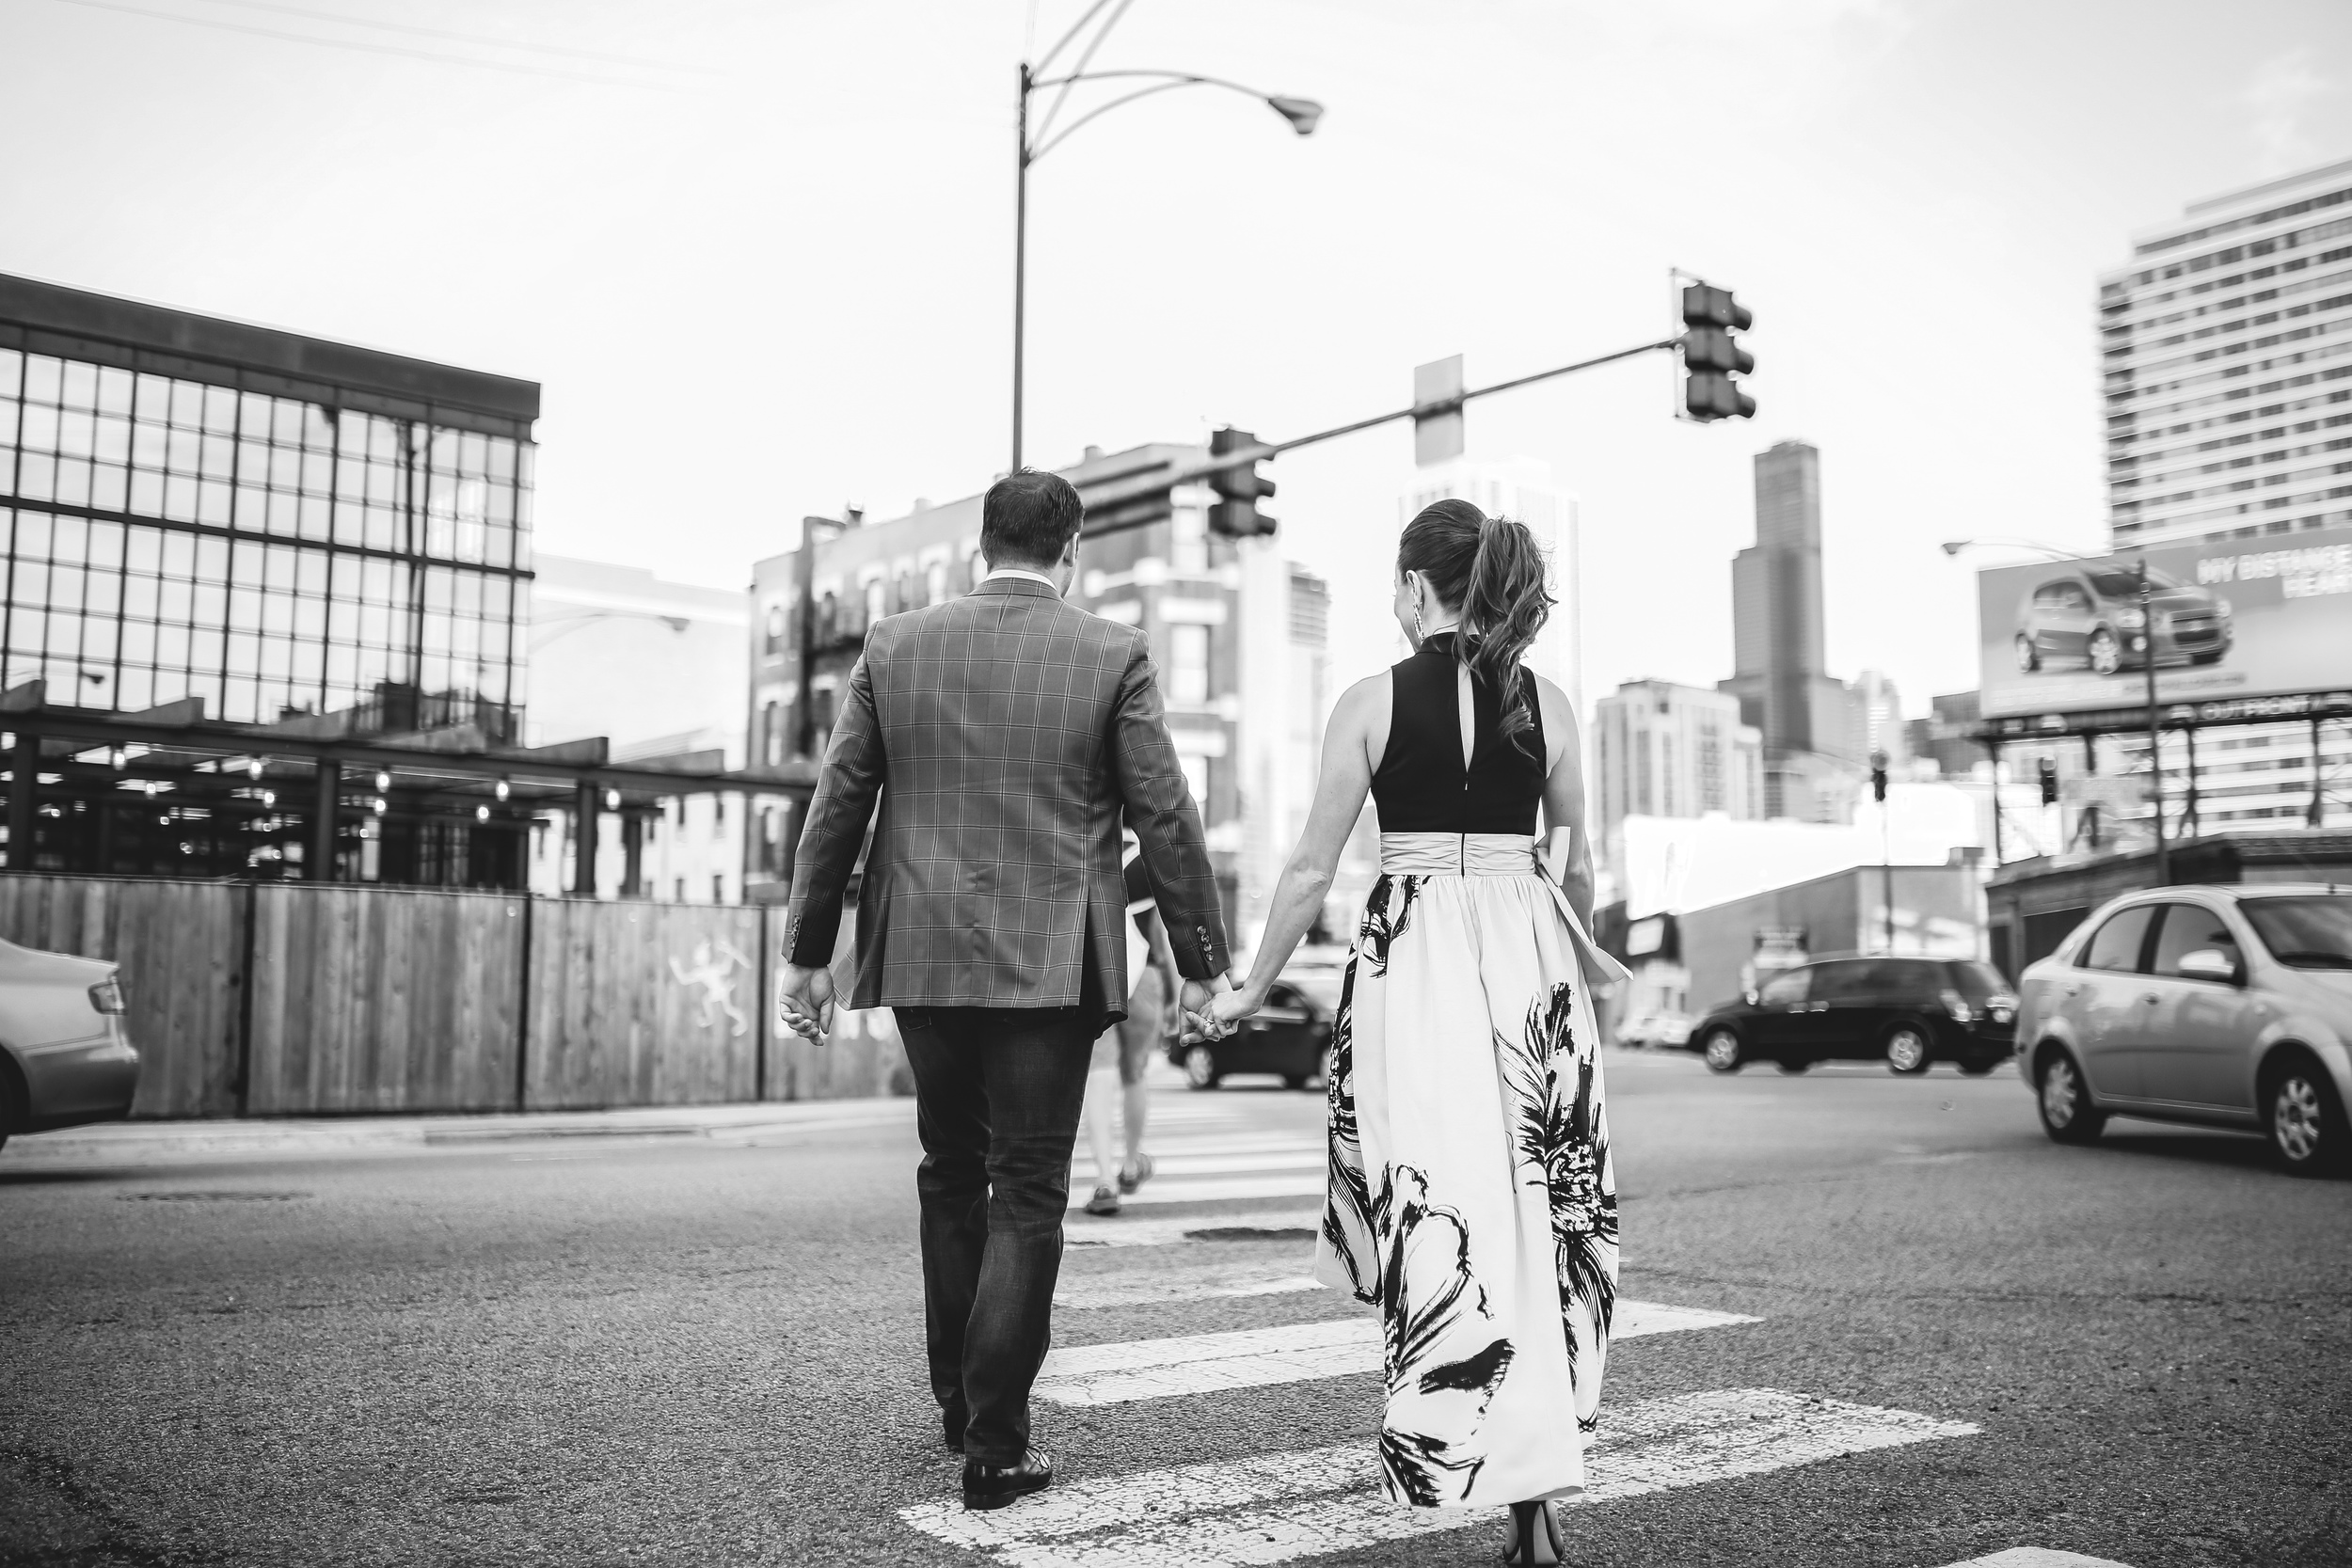 chicago street farewell holding hands